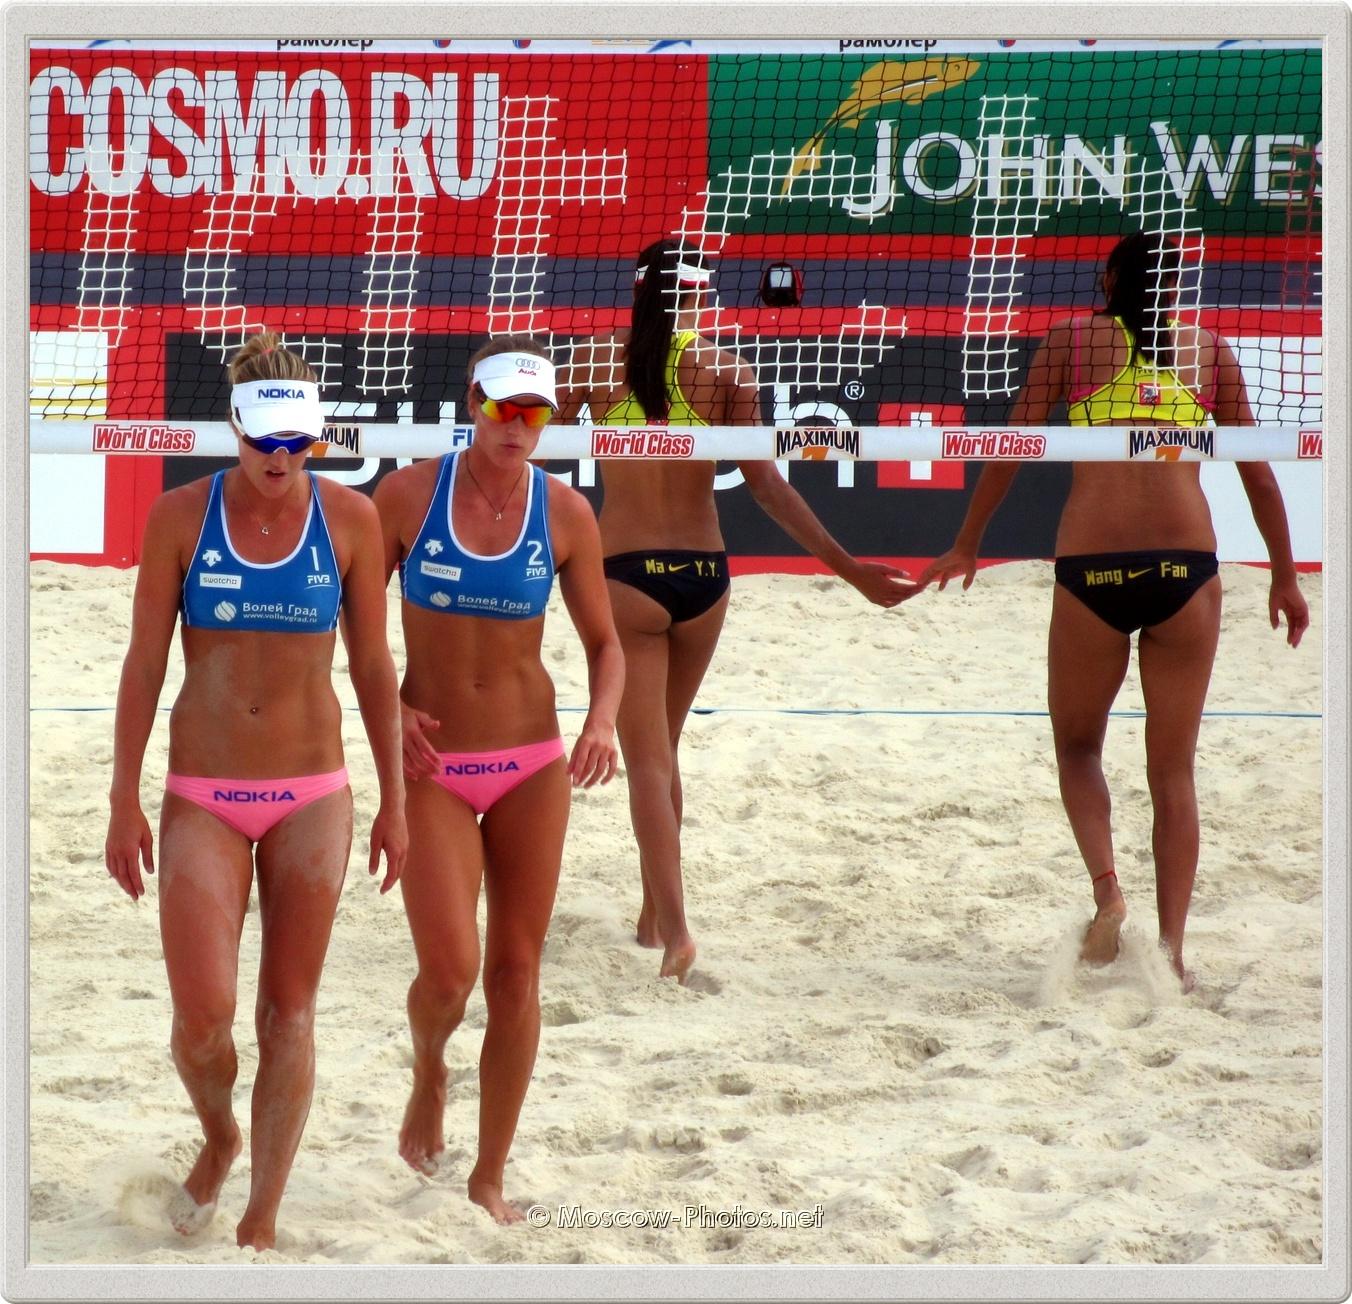 Finnish Beach Volleyball Team